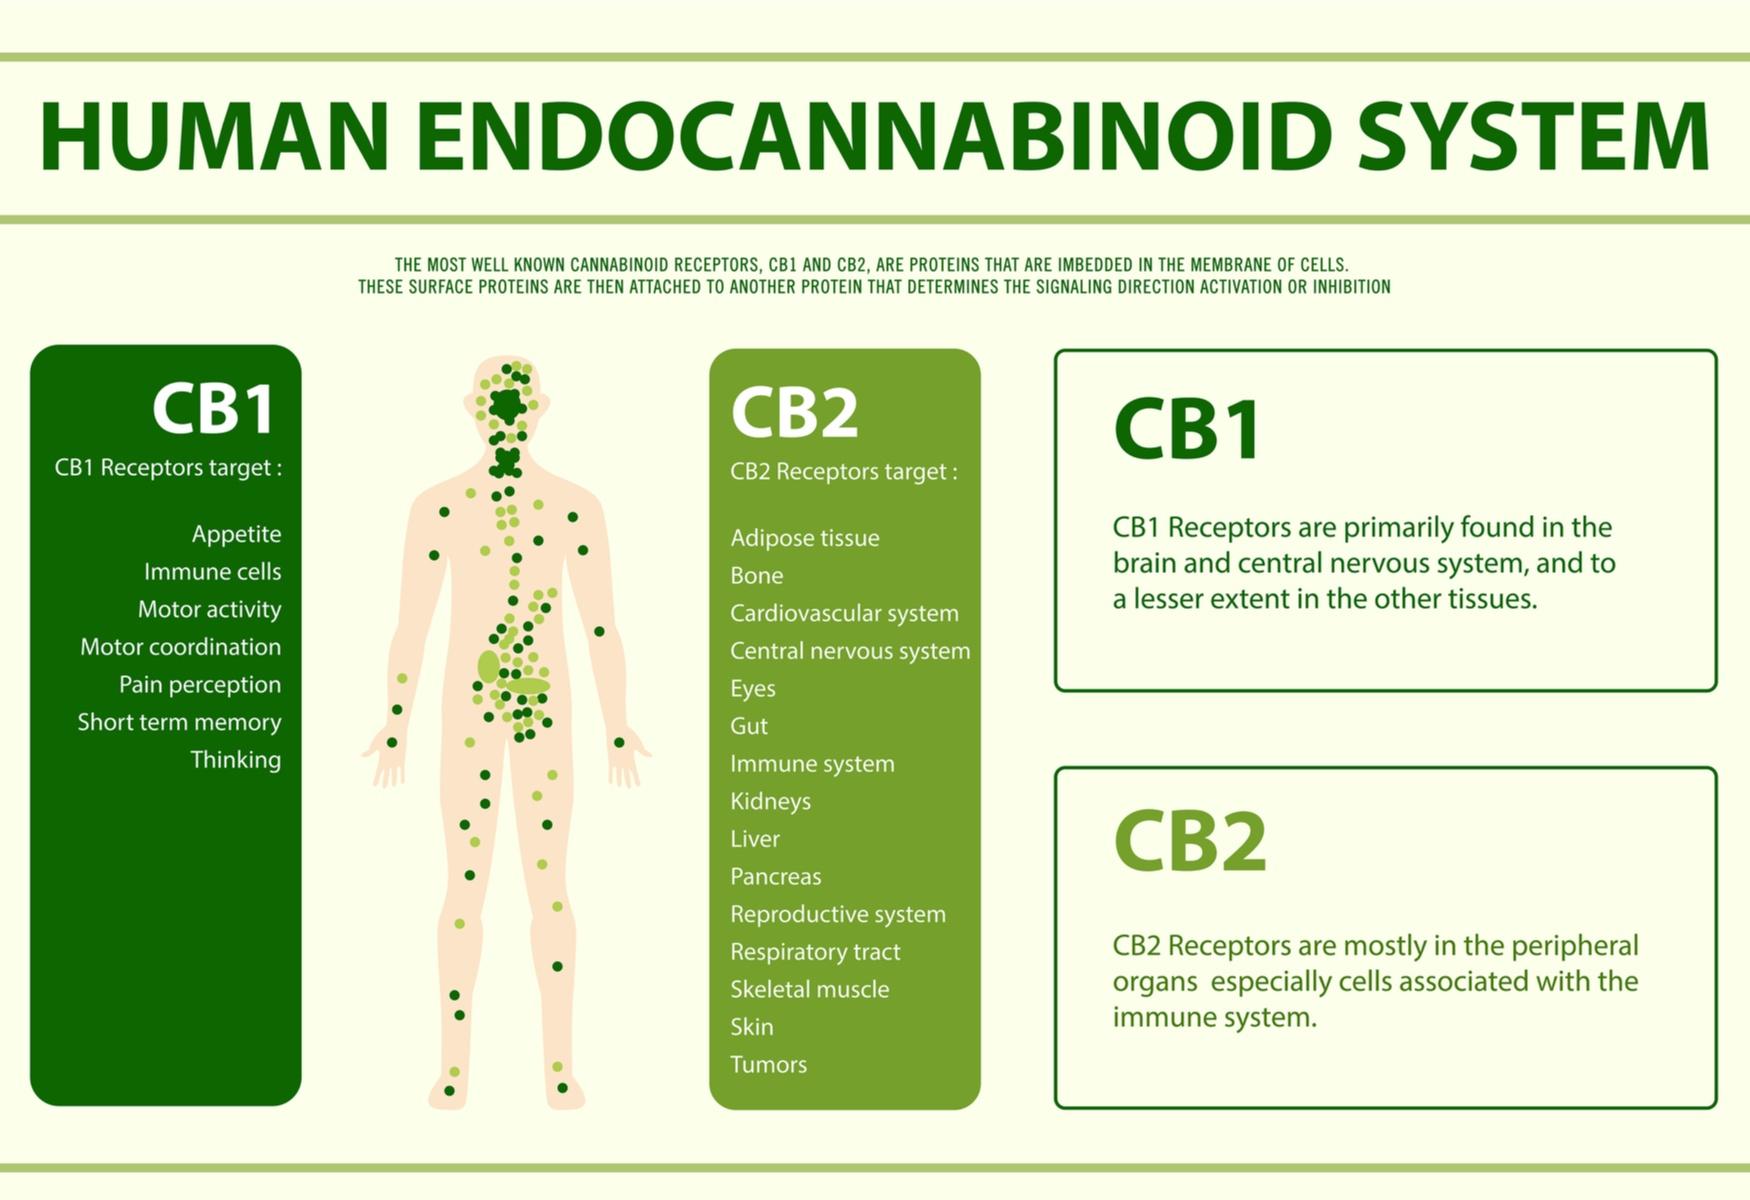 the human endocannabinoid system